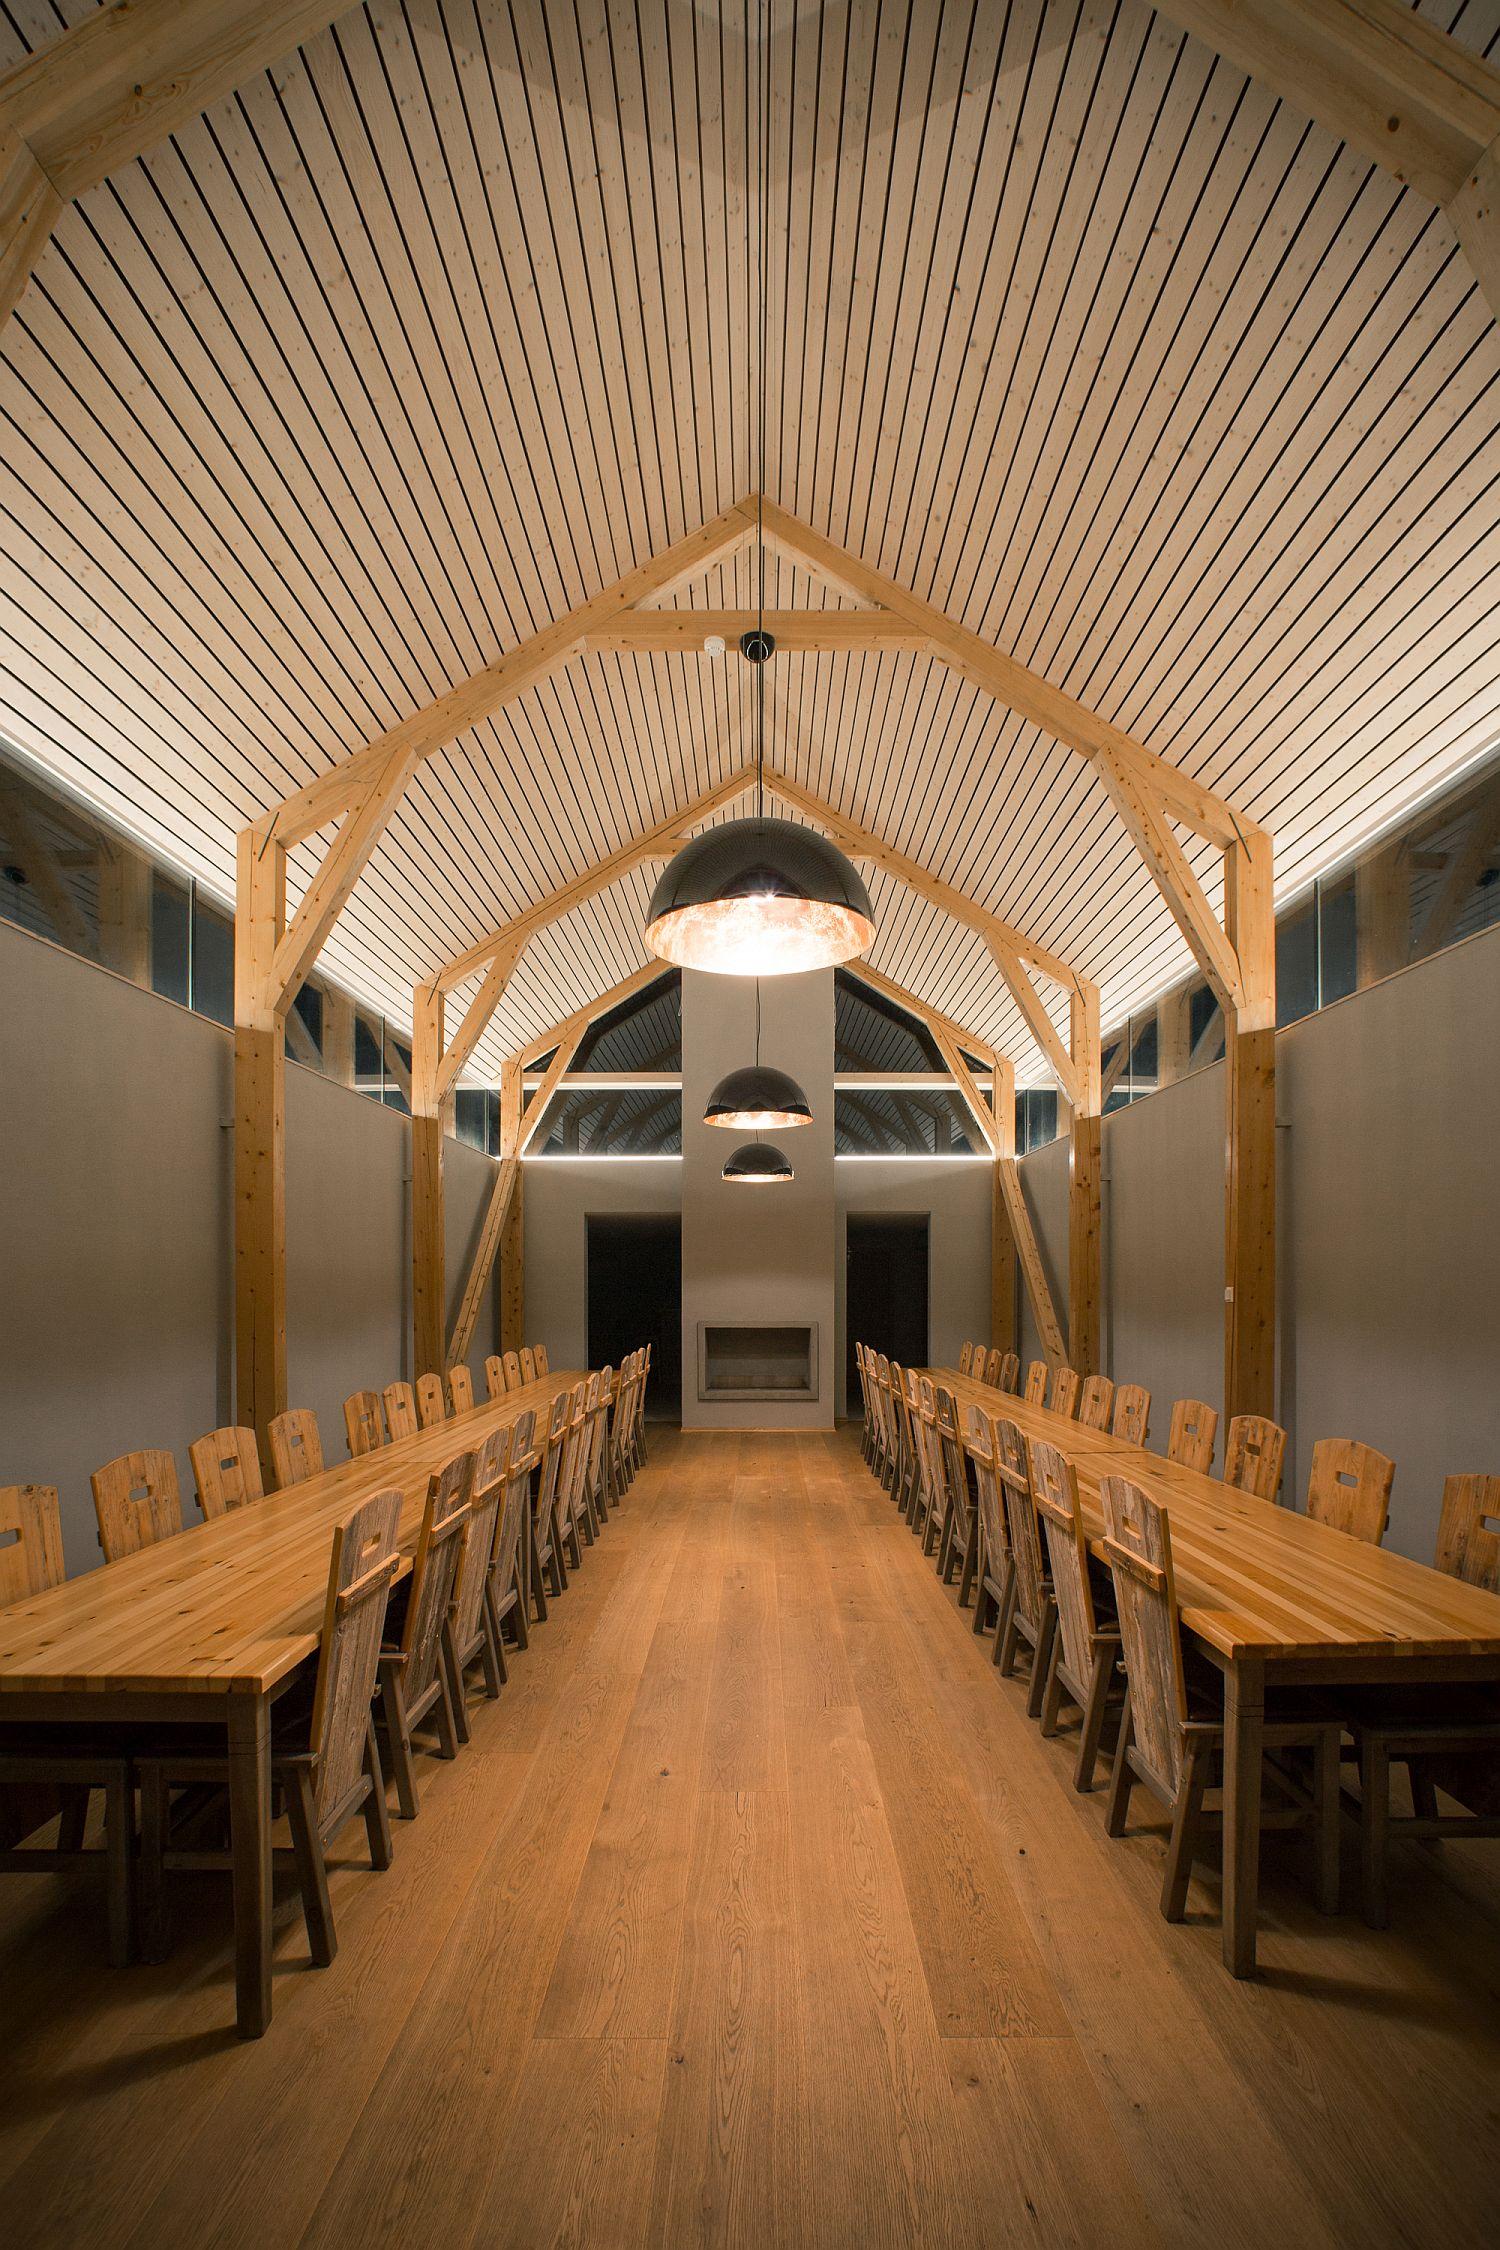 Pendnat lighting makes a big impact inside the distillery